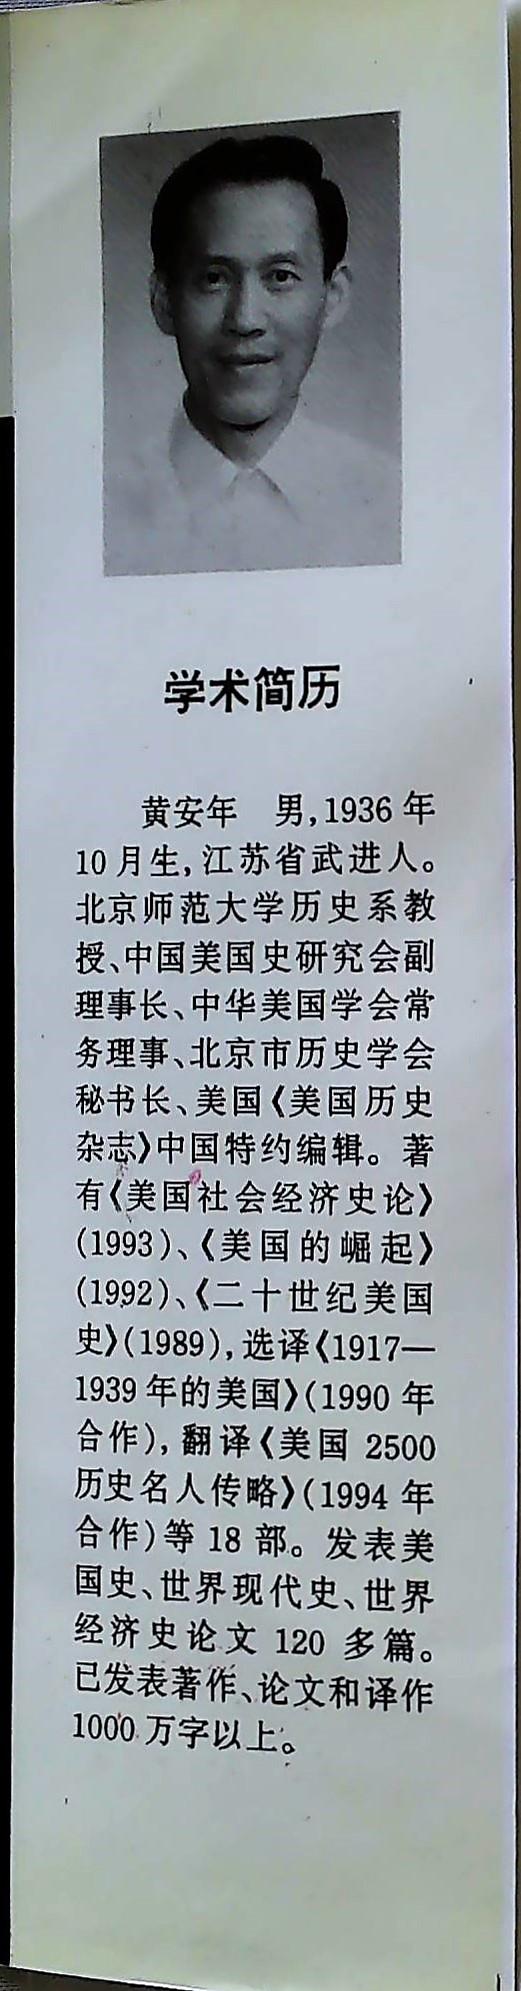 2 IMG668.jpg